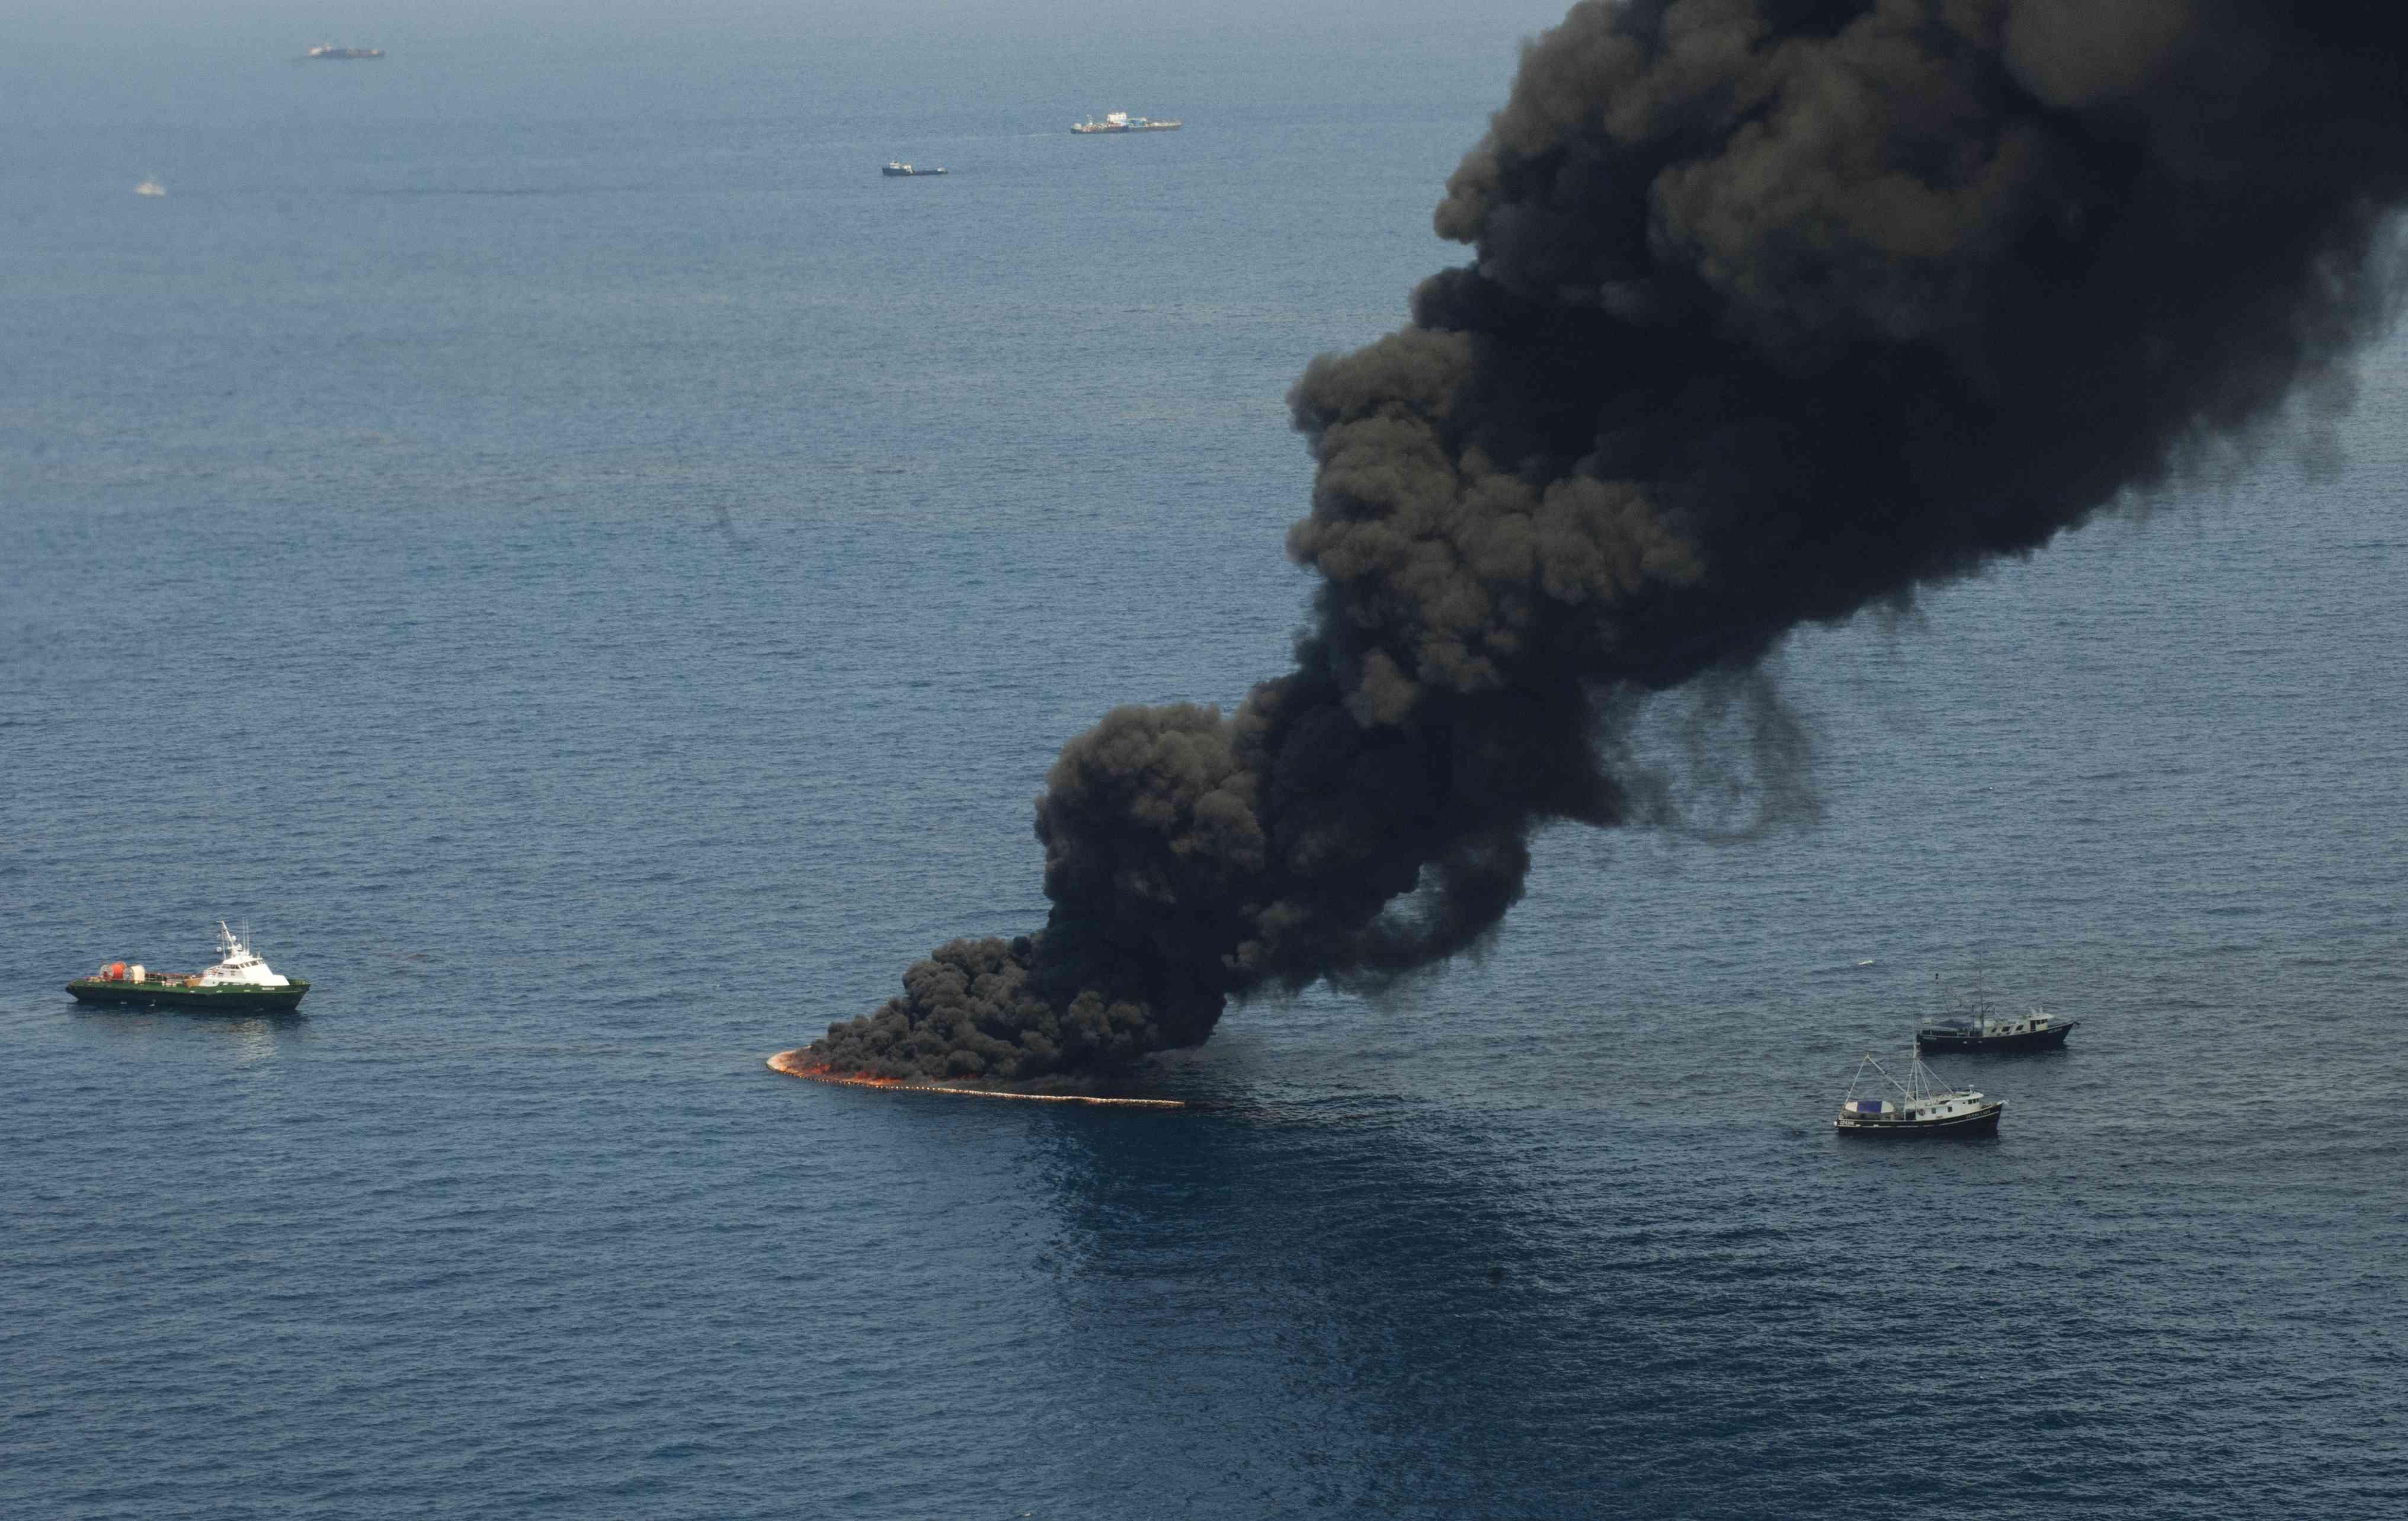 USA - Deepwater Horizon Disaster - Contianment Efforts